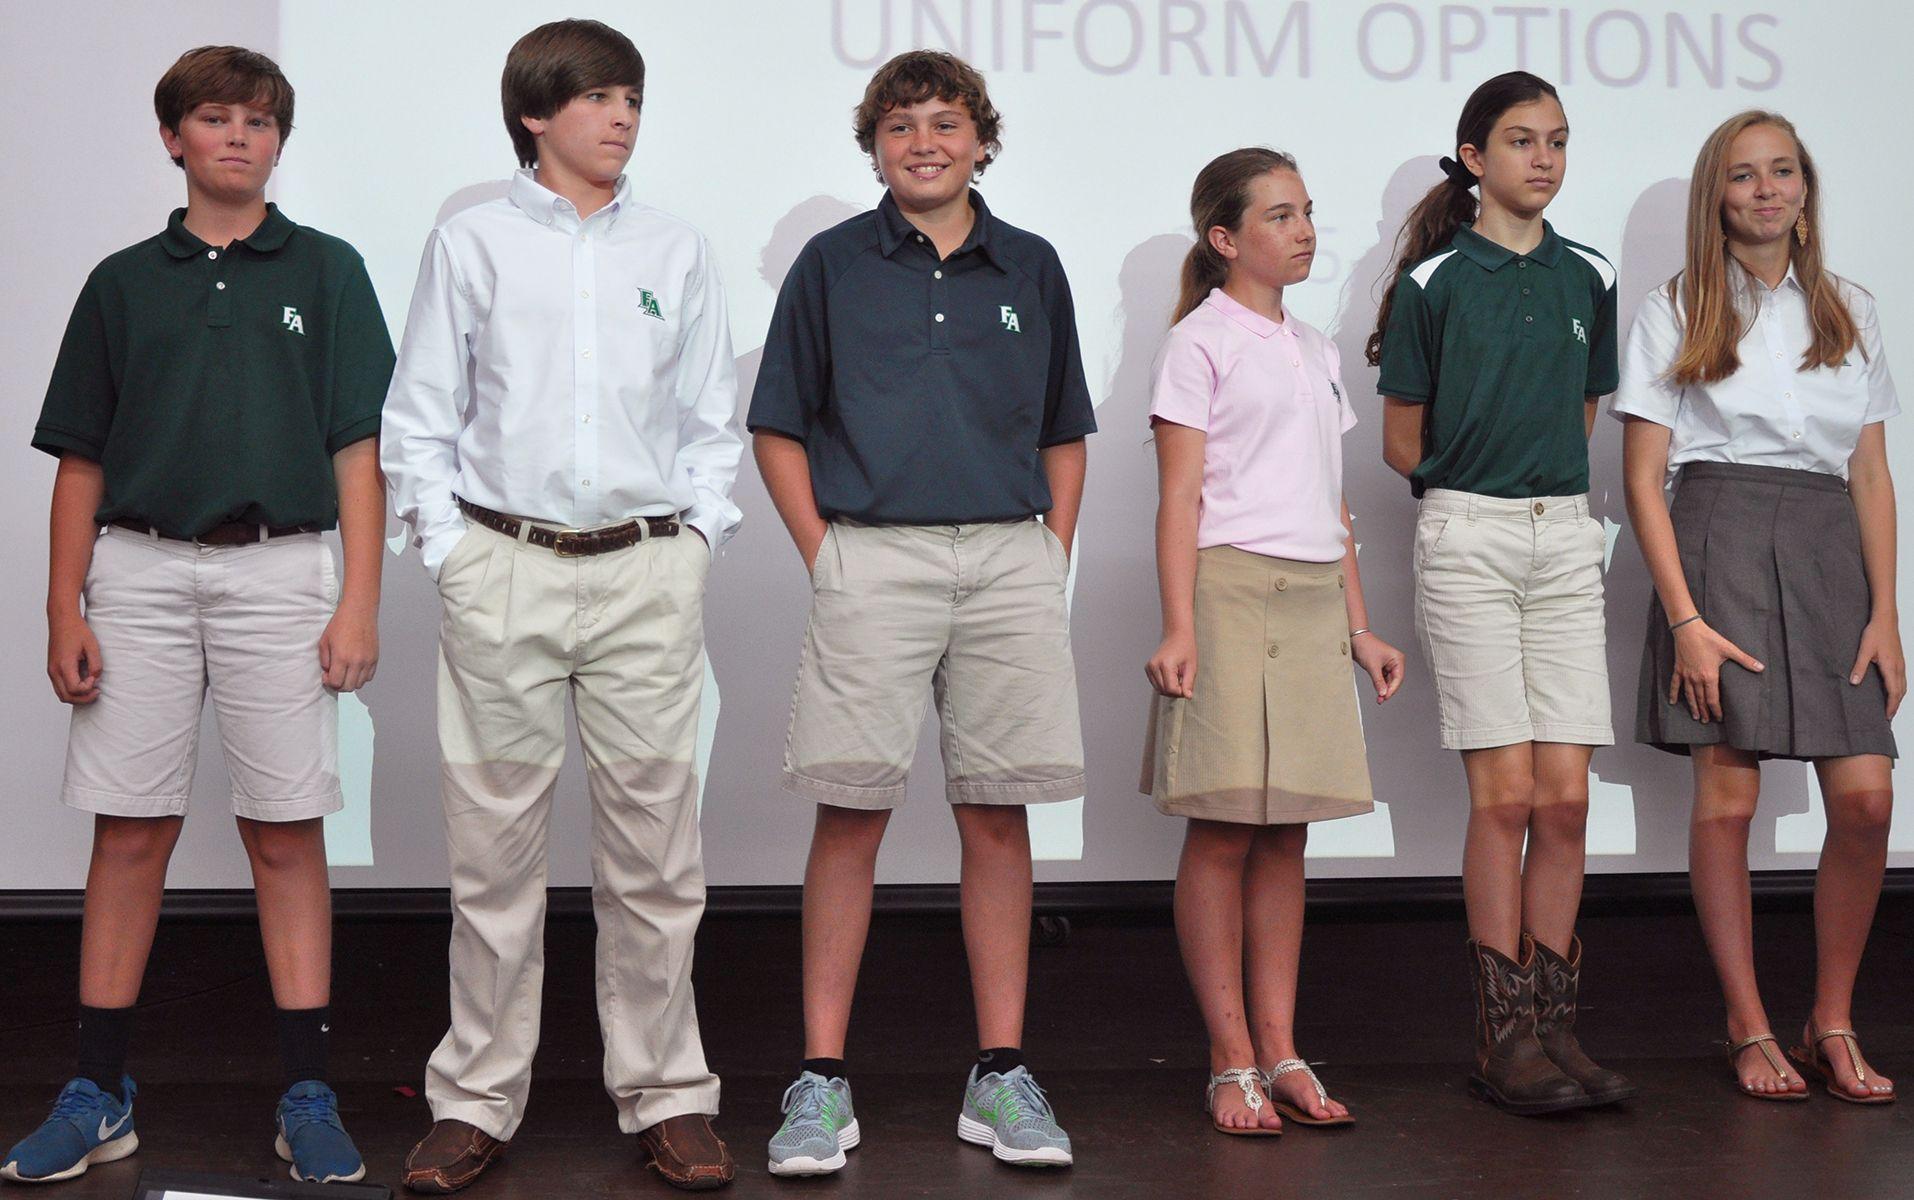 49d35149a catholic middle school uniforms - Google Search | faith the play ...